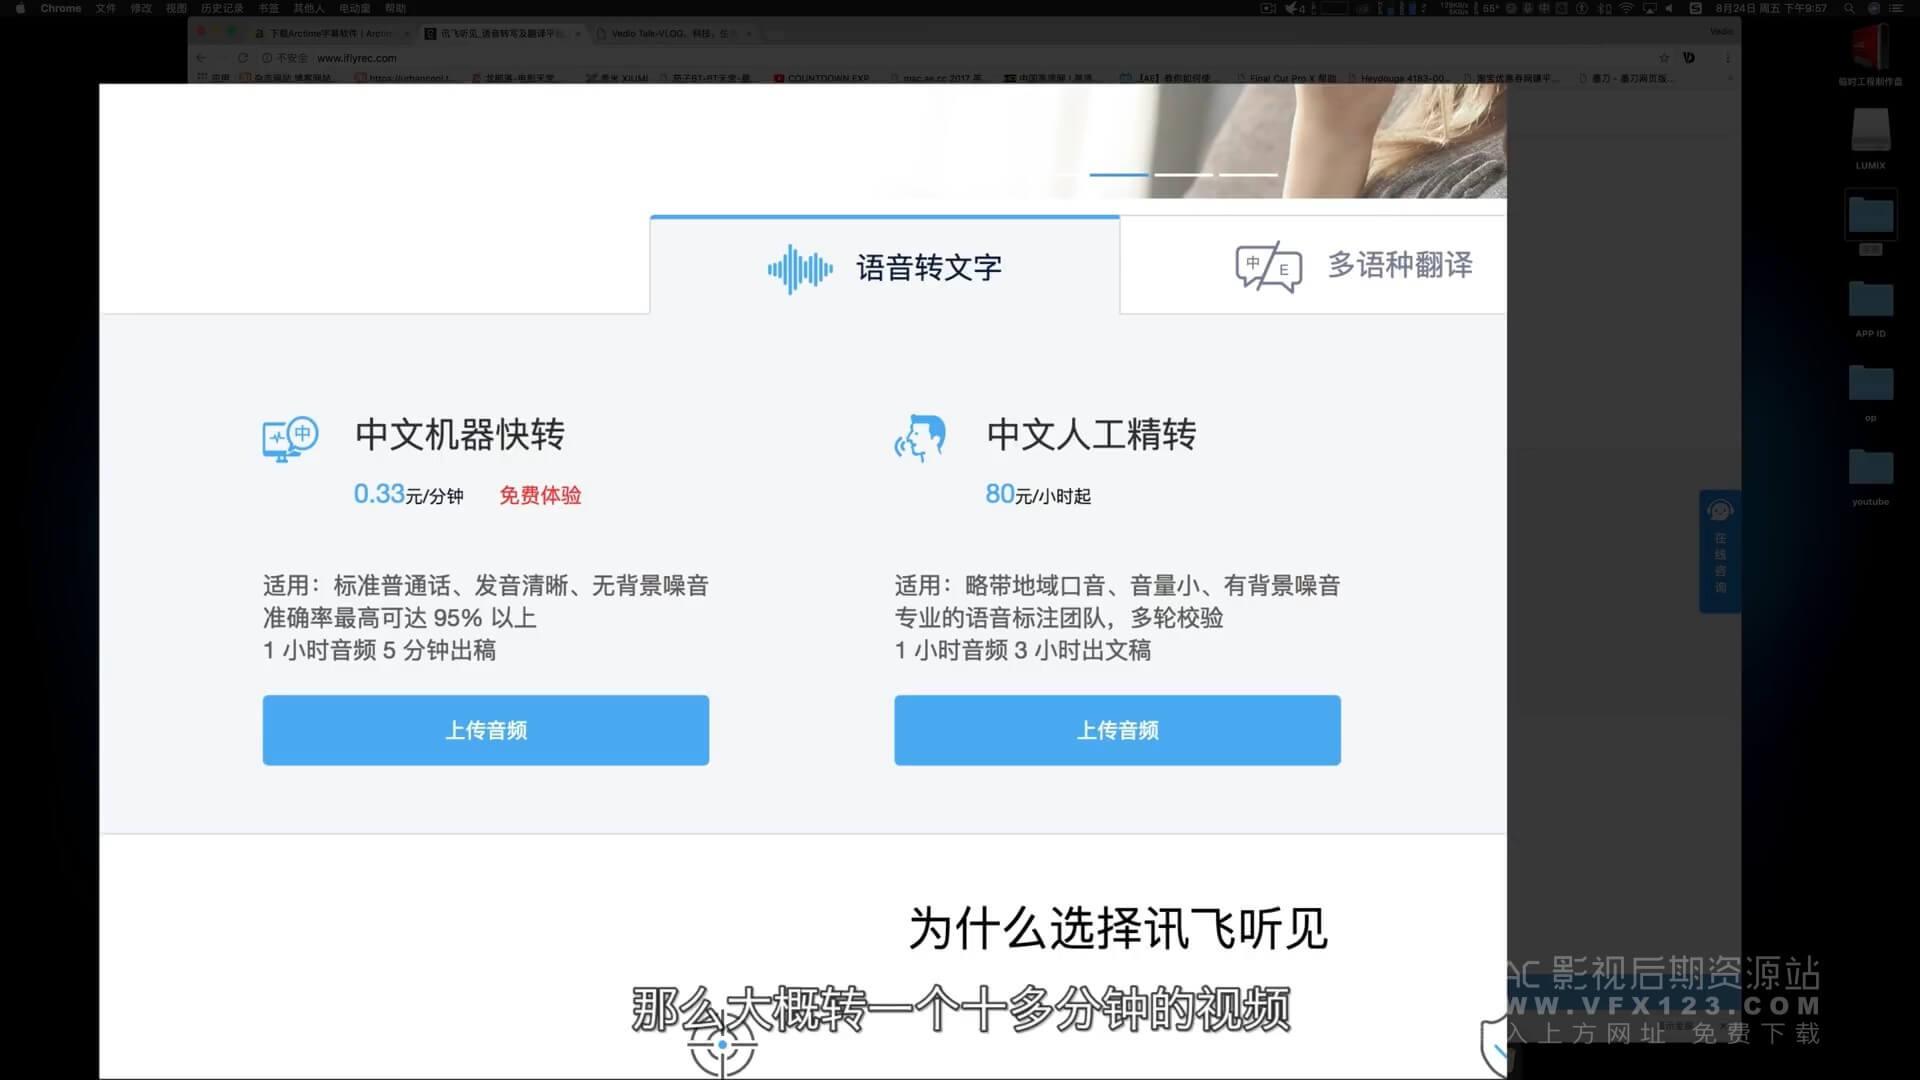 FCPX快速上字幕教程 5分钟给视频添加上千字幕